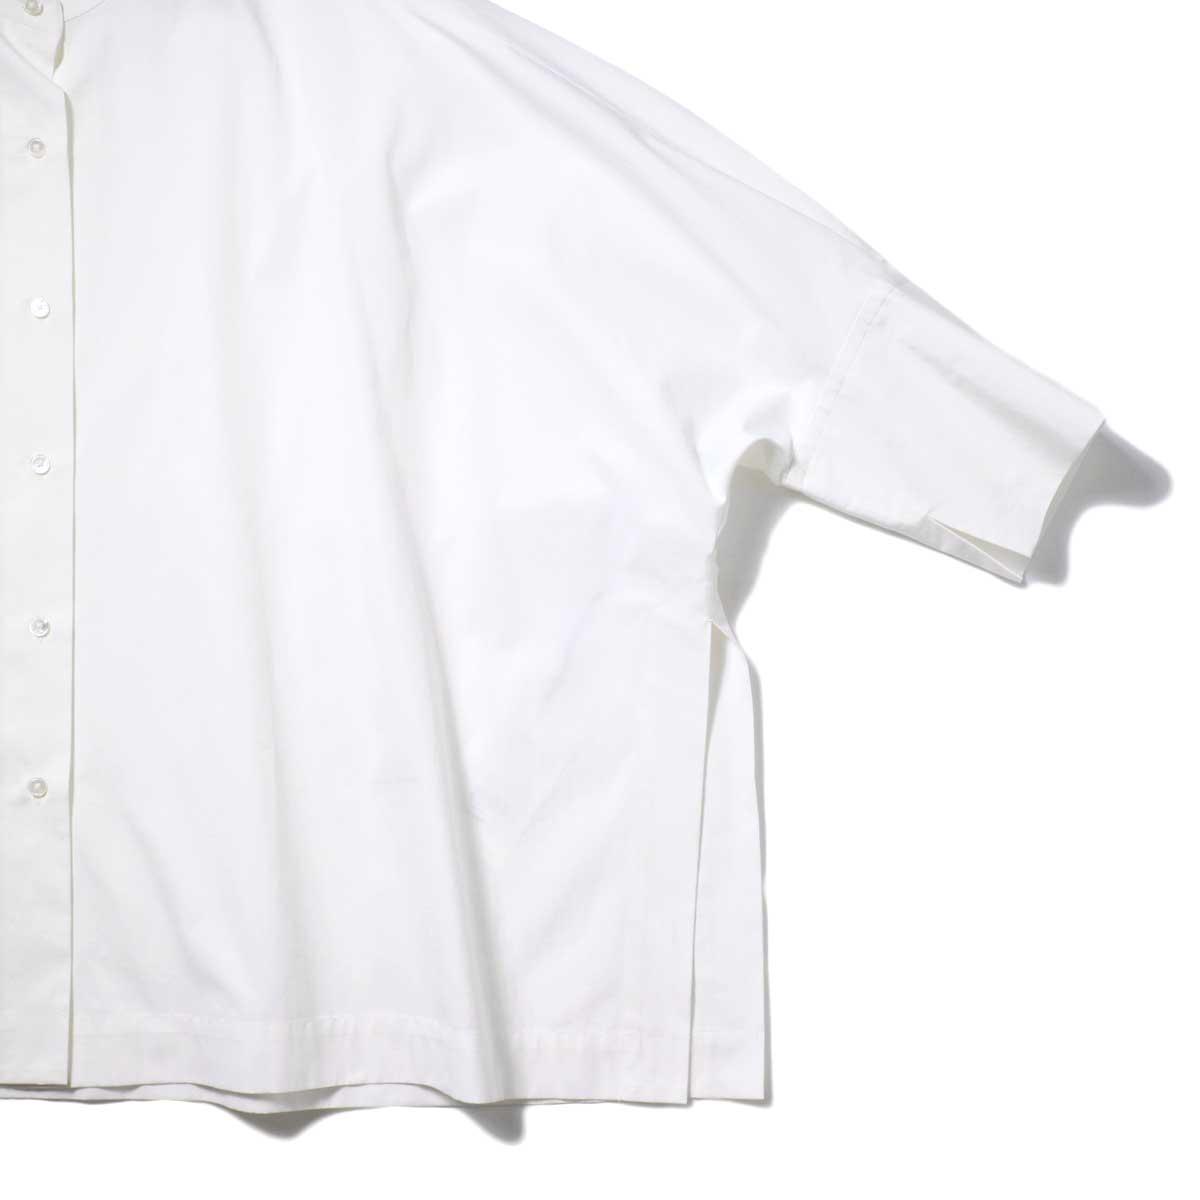 YLEVE / COTTON TYPEW RITER BIG SHIRT (White) 袖・裾